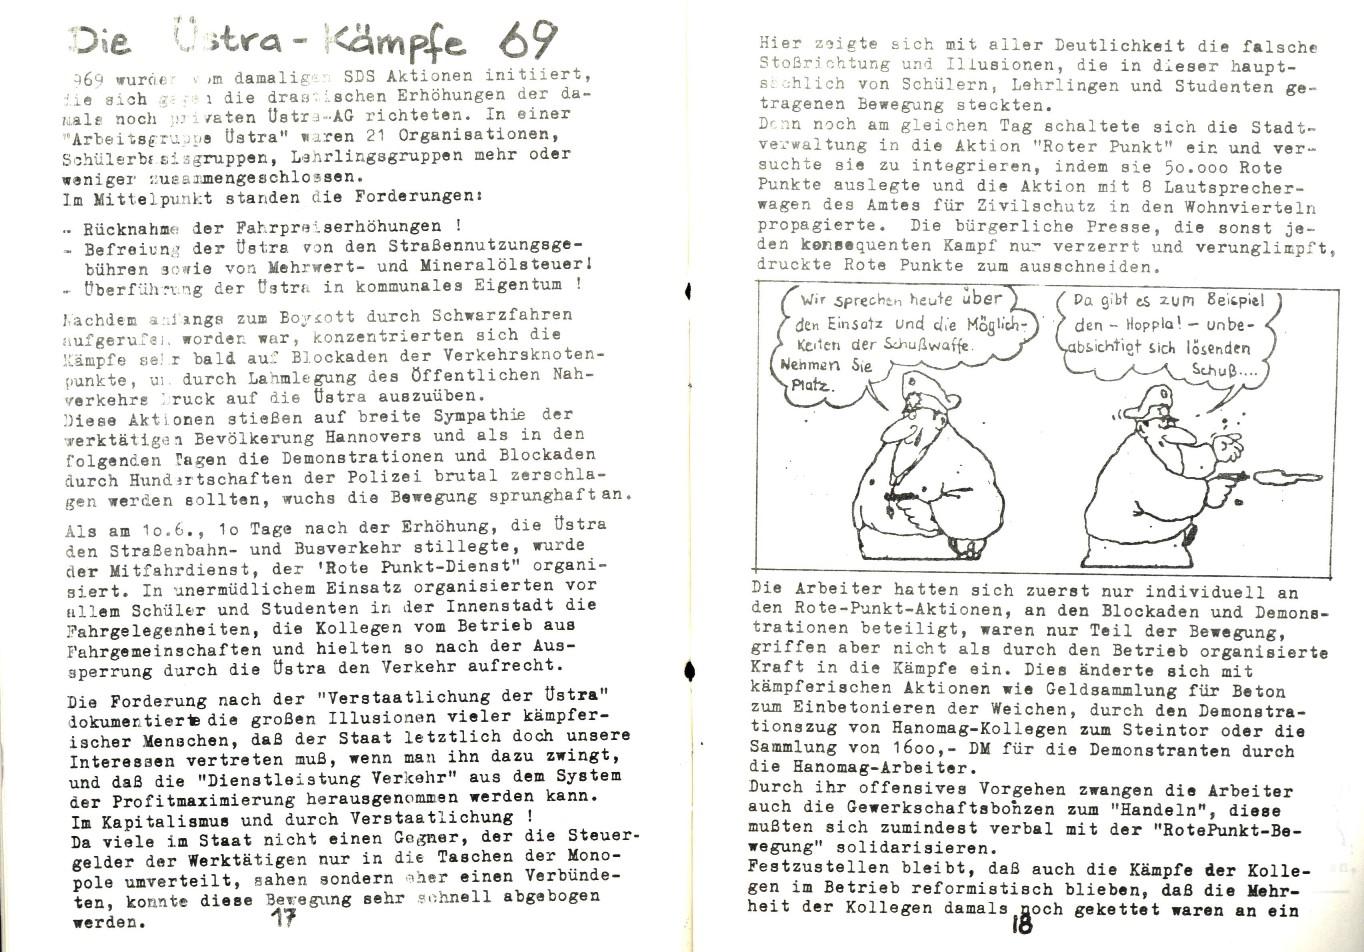 Hannover_AO_1975_Fahrpreisboykott_10